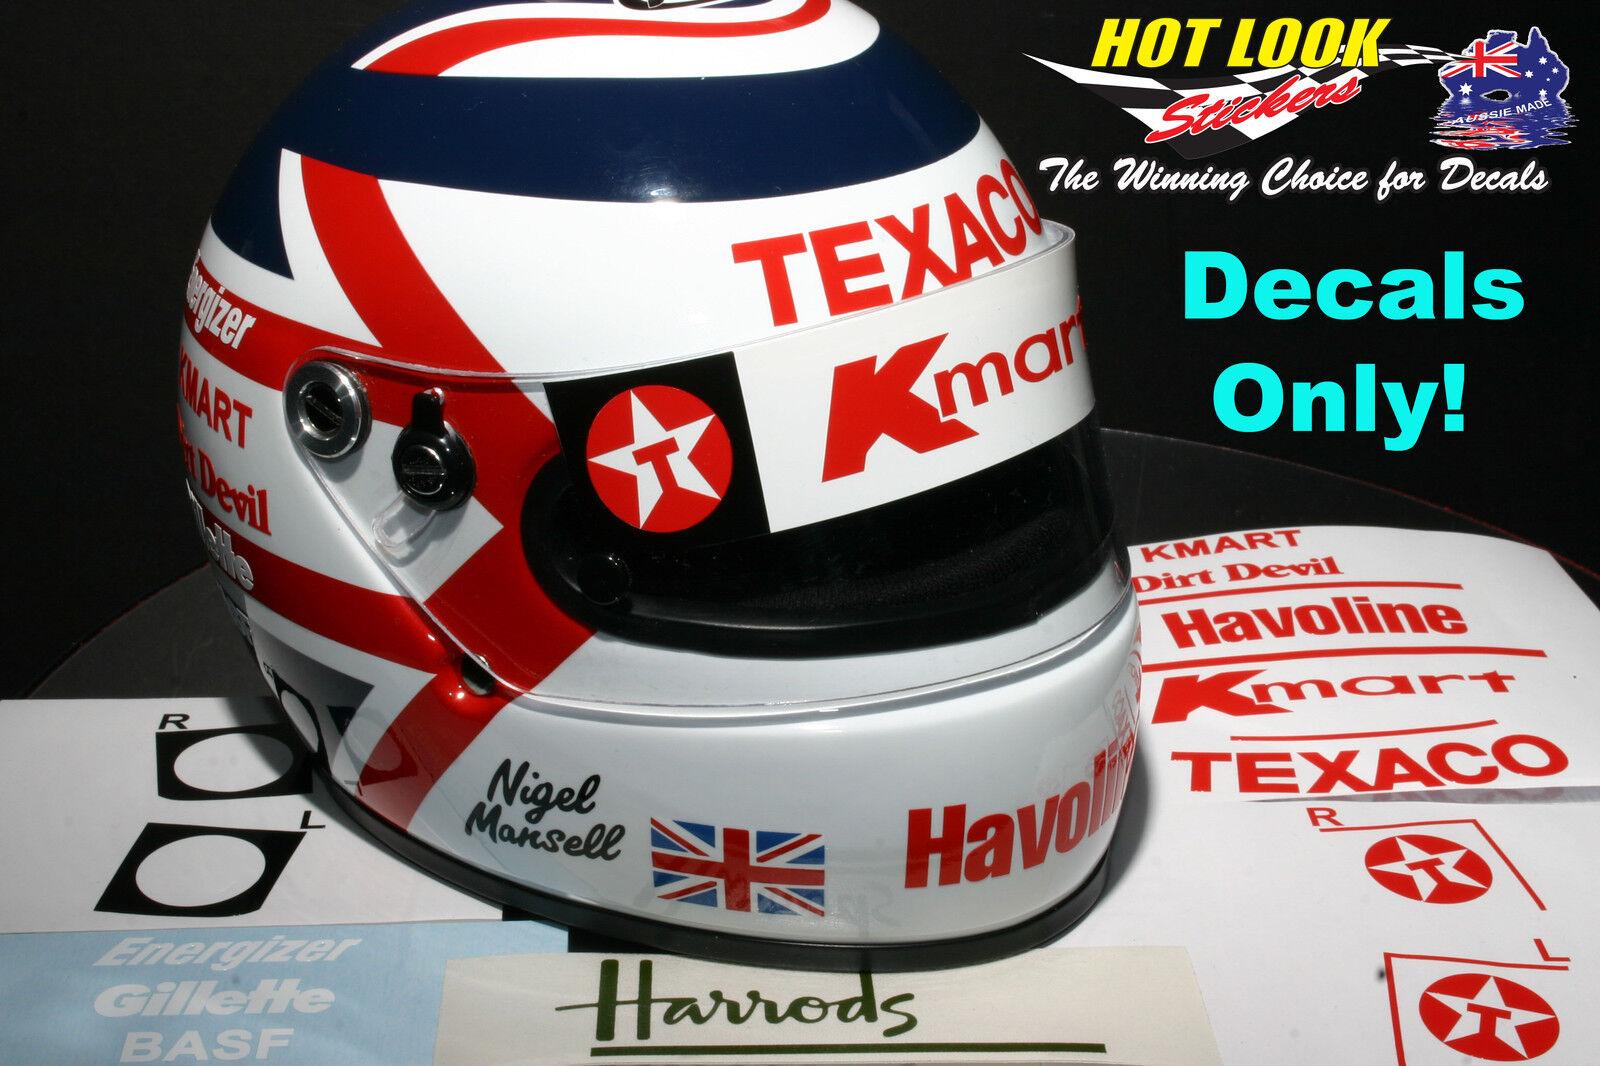 Nigel Mansell Arai 1 2 Helmet Missing Decals cut Vinyl 1993 Indy Car Champion